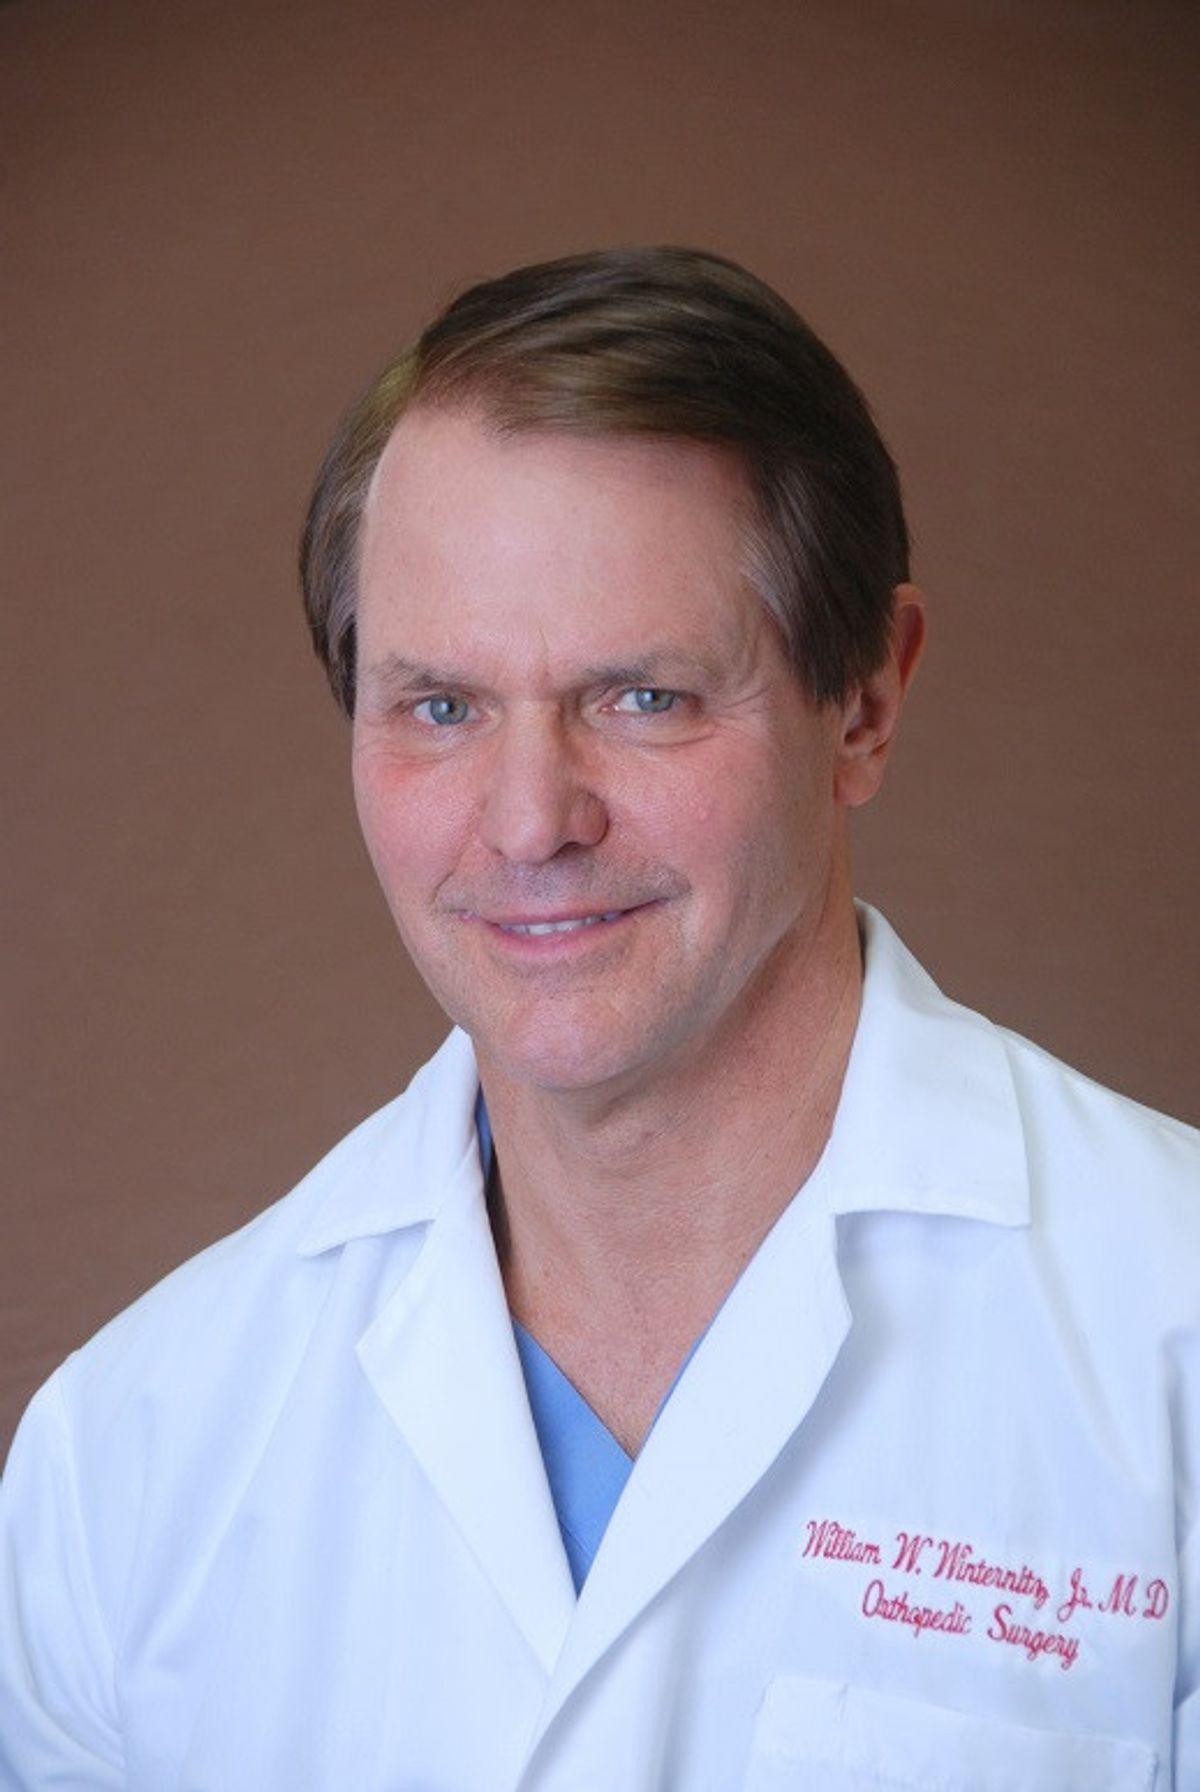 Dr William Winternitz Md Poway Ca 92064